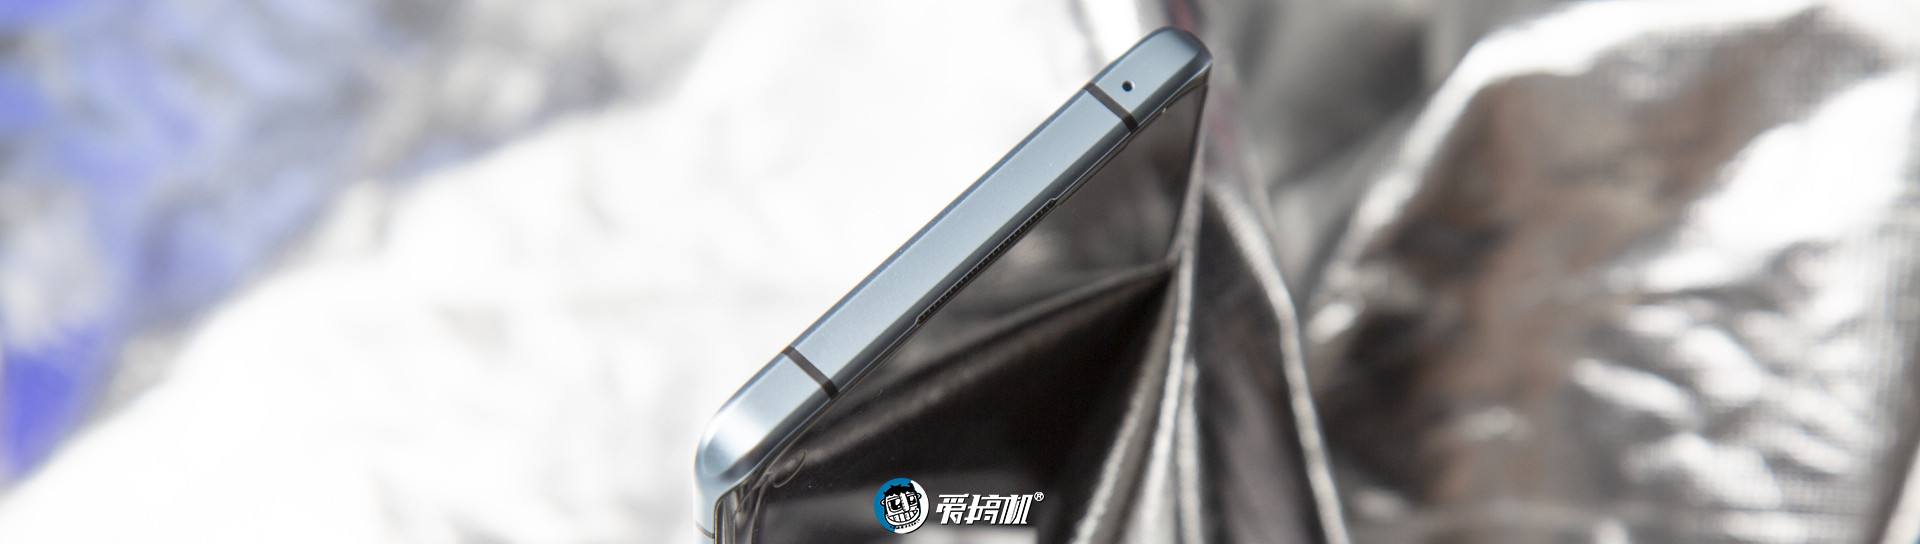 OPPO Reno3 Pro上手评测 可能是最轻薄的5G手机